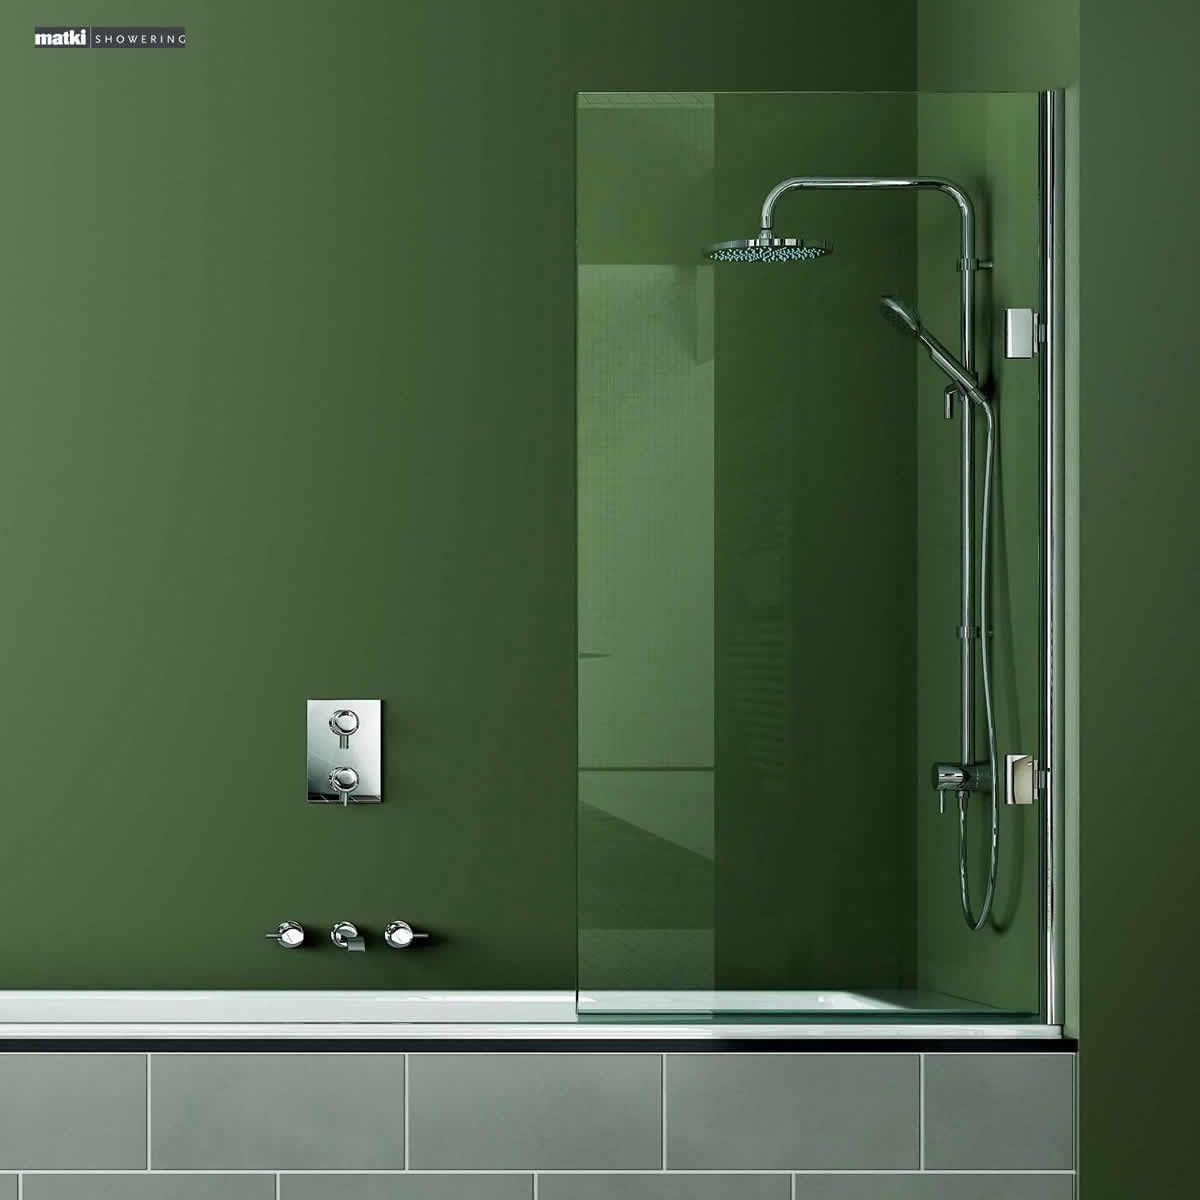 100 bath shower screens uk april identiti2 shower bath shower screens uk matki single bath screen 10mm uk bathrooms